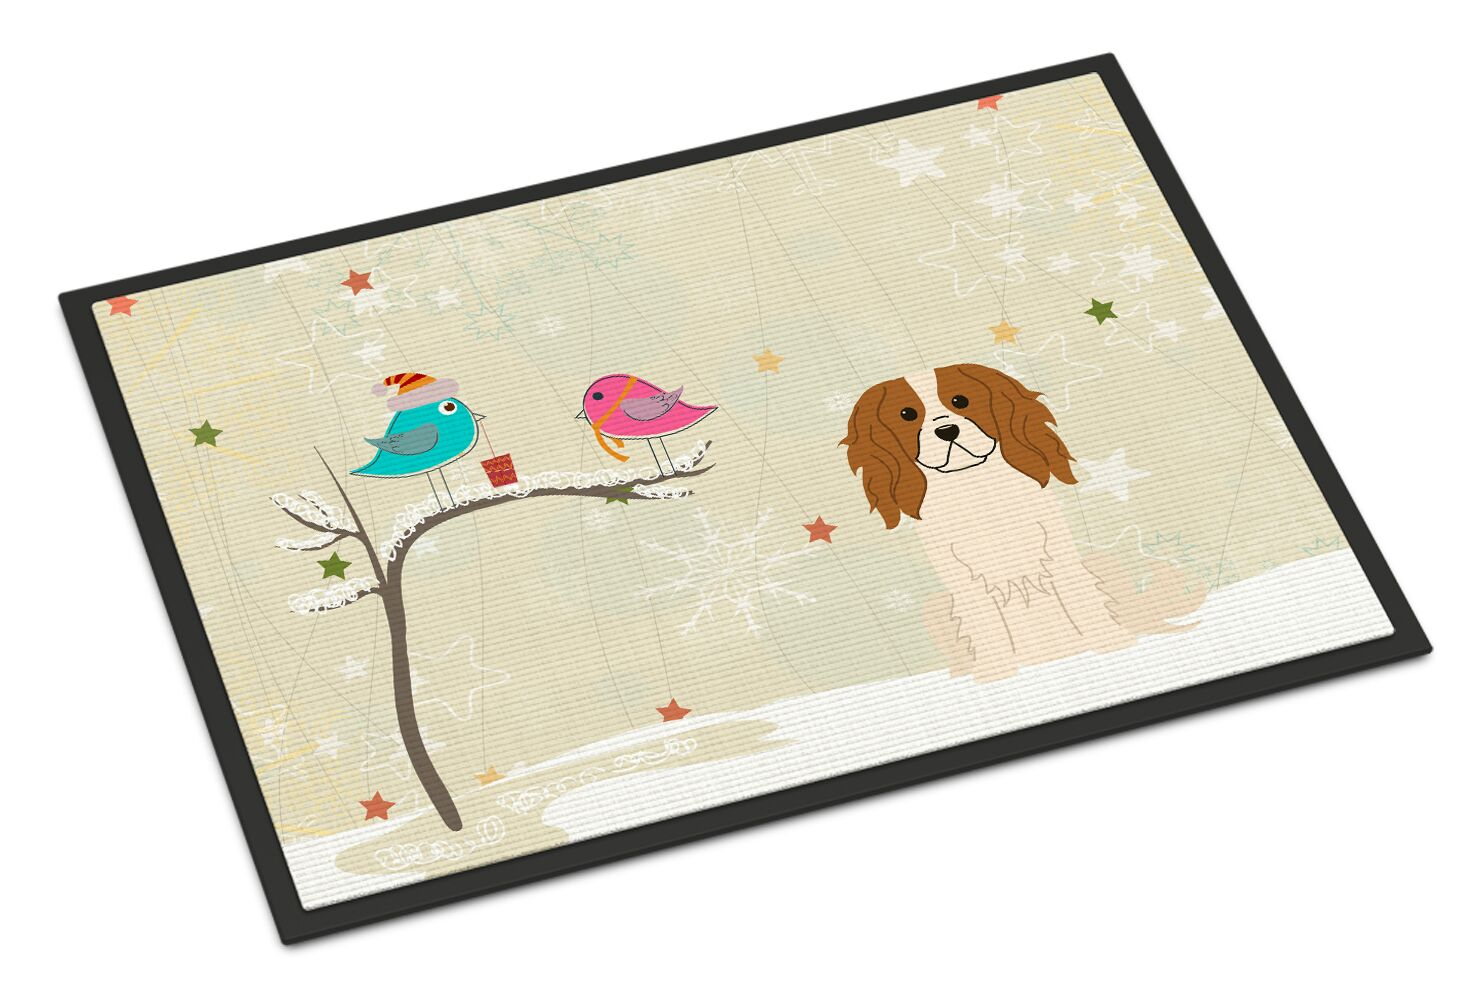 Christmas Presents Between Friends Cavalier Spaniel Doormat Mat Size: Rectangle 2' x 3'